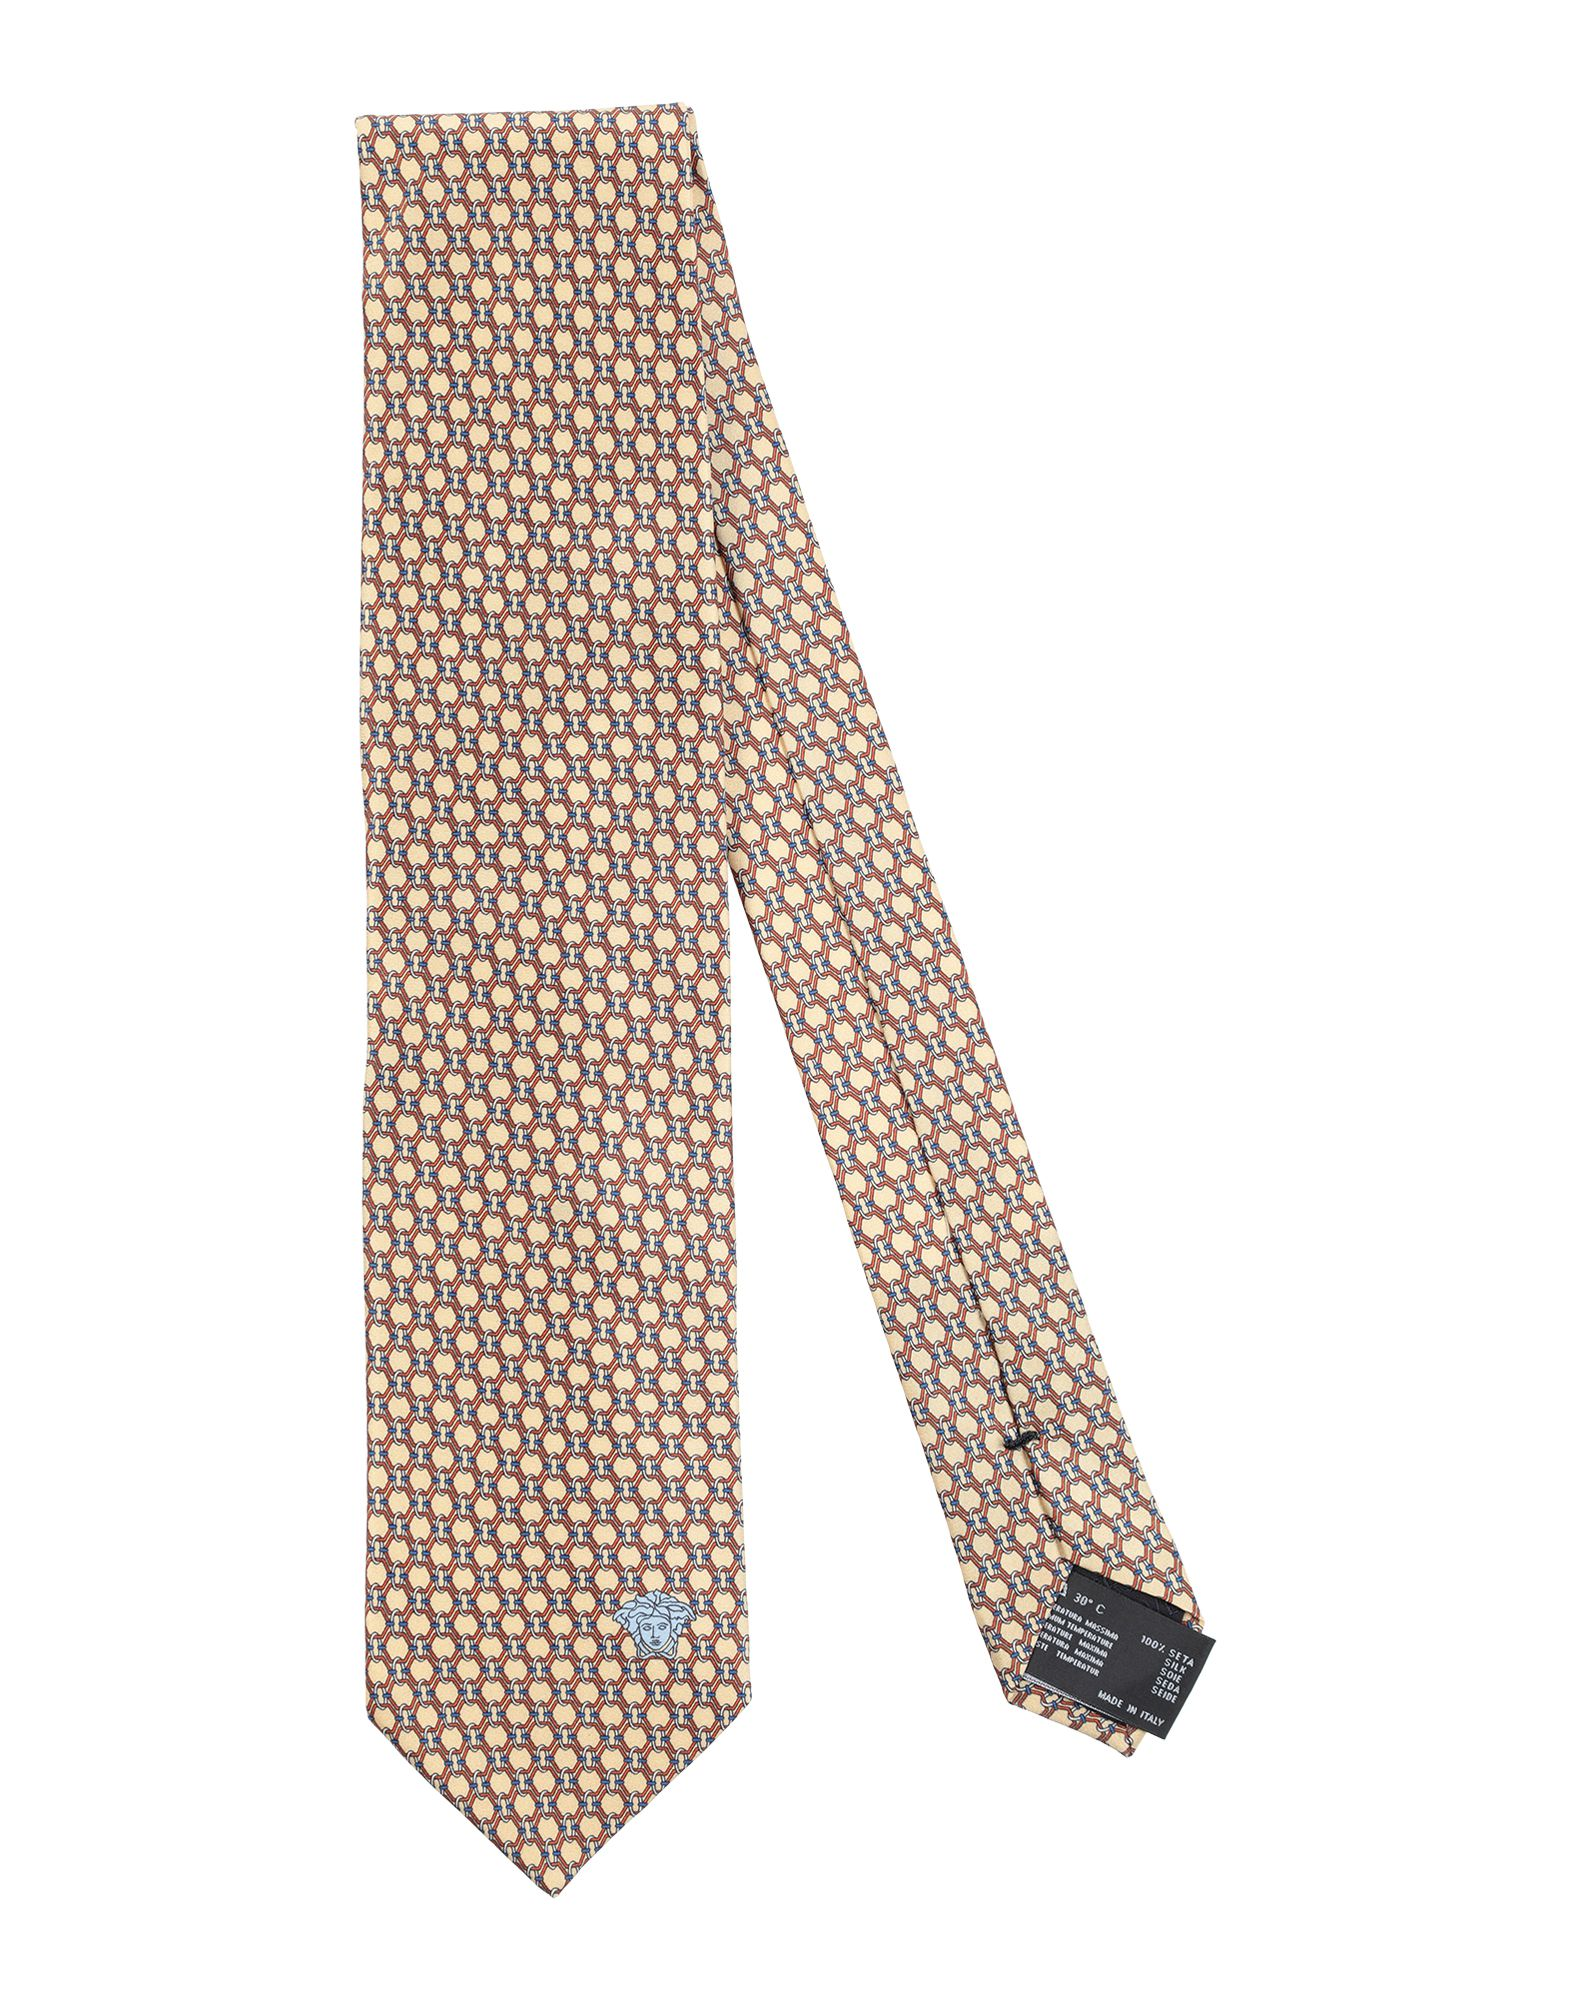 VERSACE Галстук versace бордовый галстук в клетку внизу с логотипом versace 821752 page 5 page 2